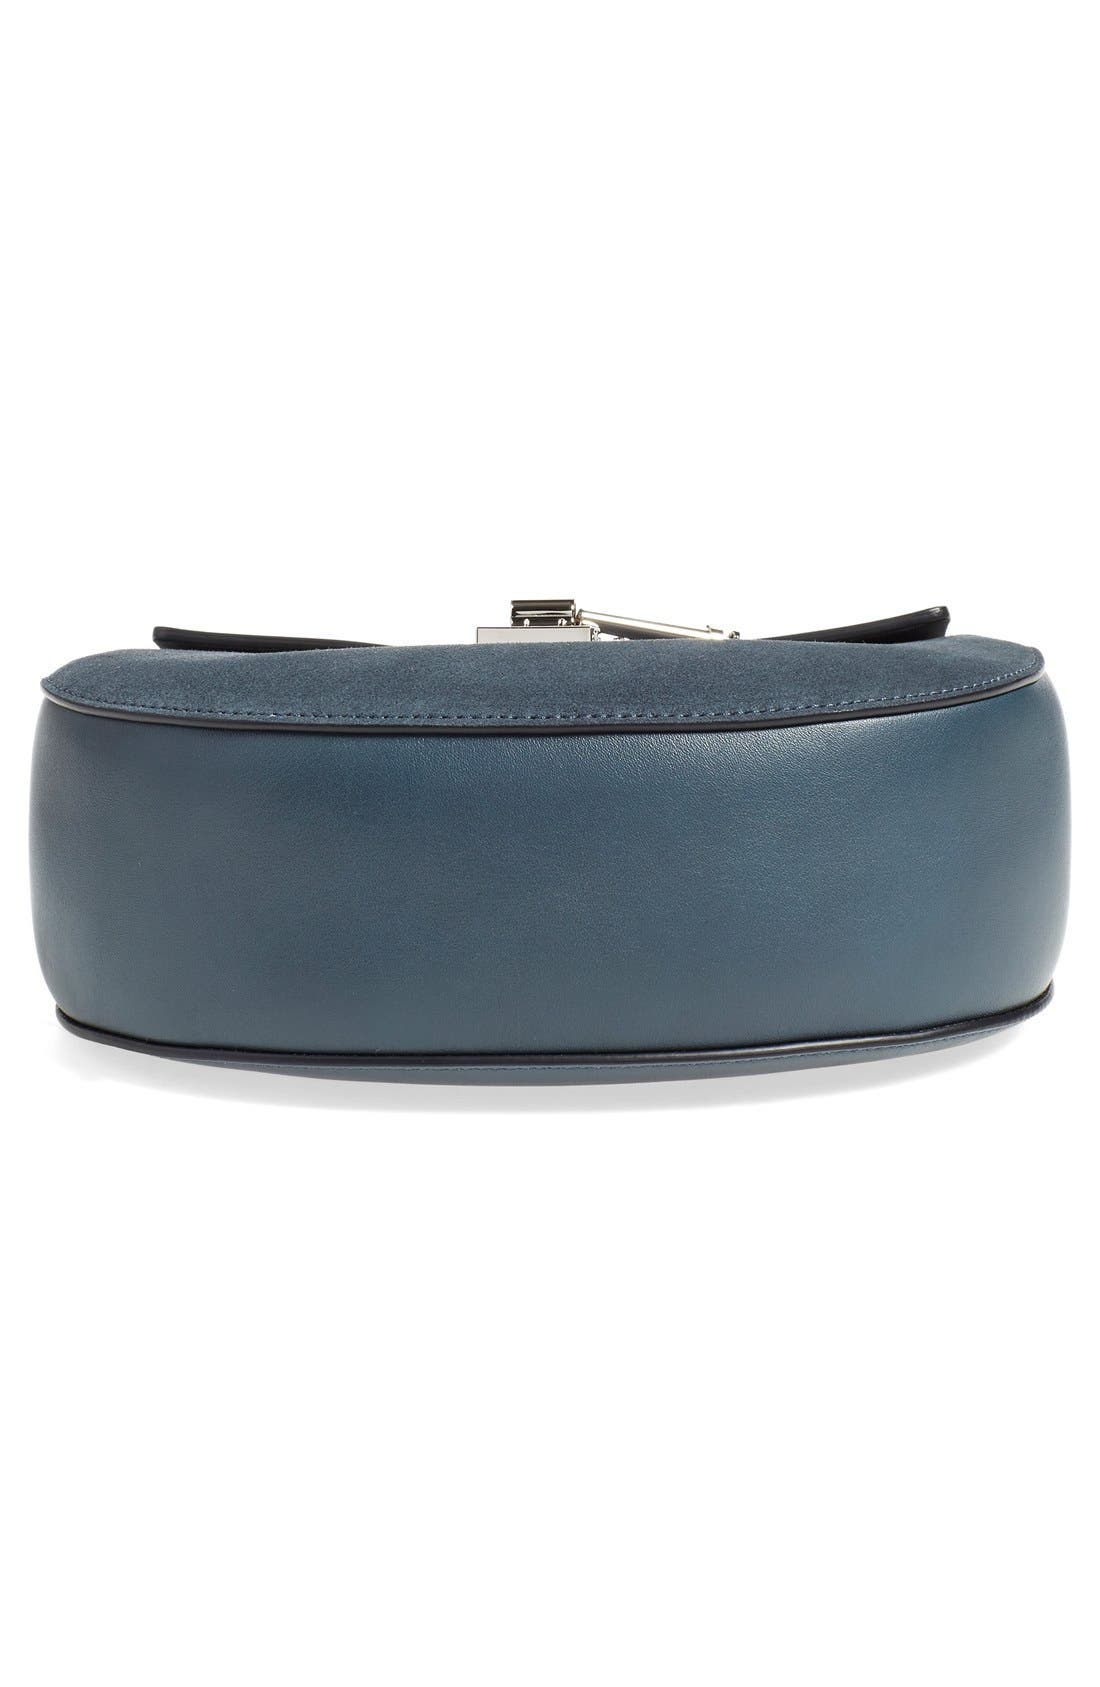 Alternate Image 5  - Chloé Small Drew Leather & Suede Shoulder Bag